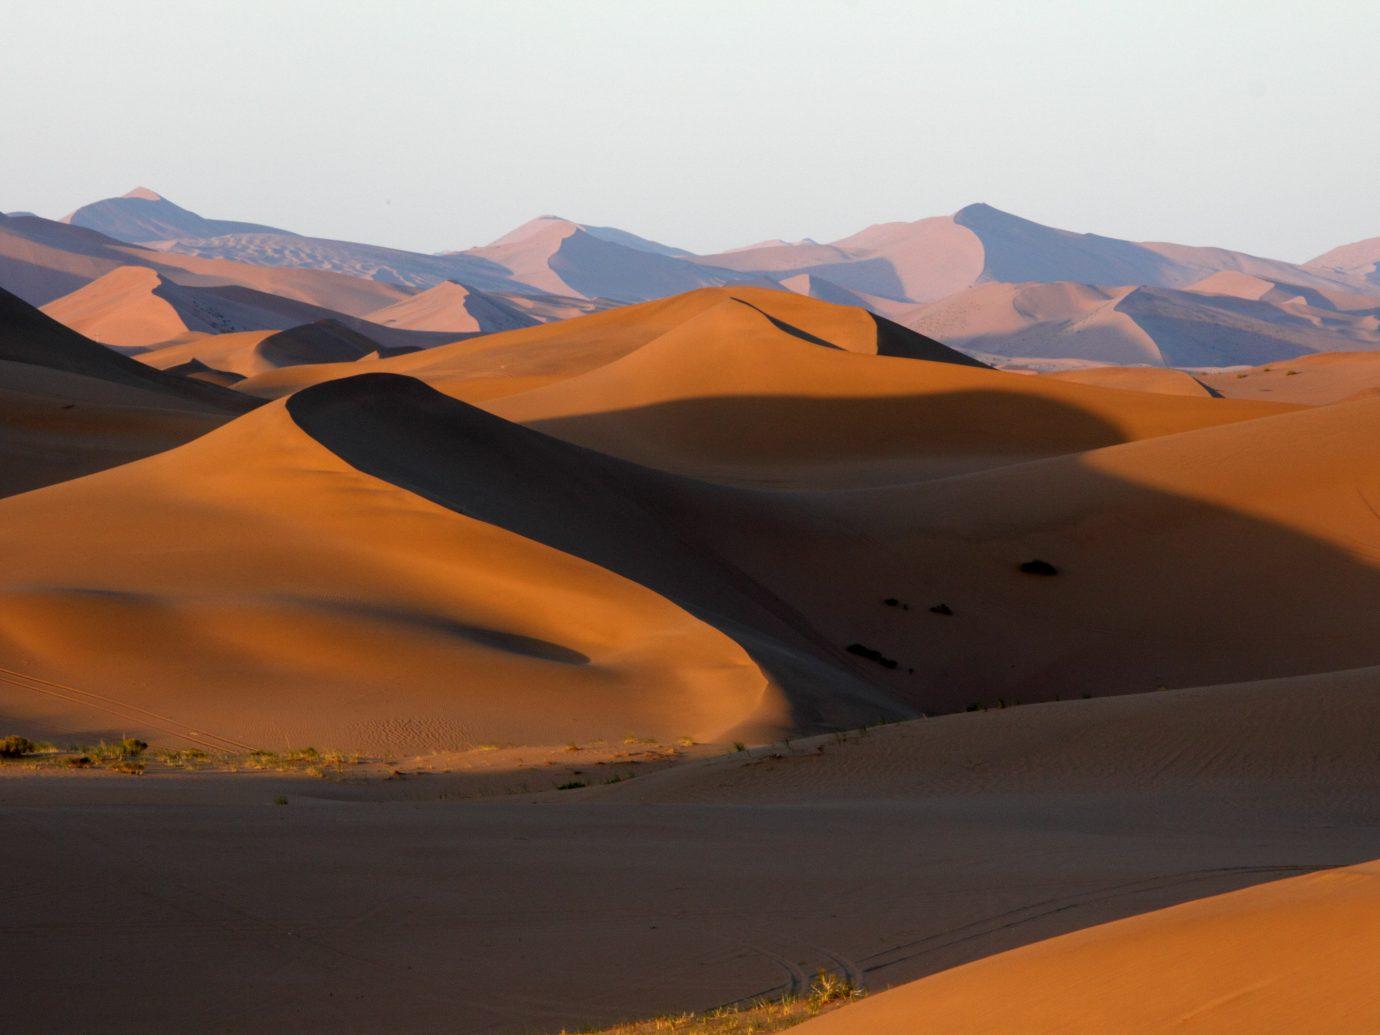 Trip Ideas mountain sky Nature outdoor erg habitat geographical feature natural environment sahara landform Desert aeolian landform landscape orange sand wadi dune plateau distance